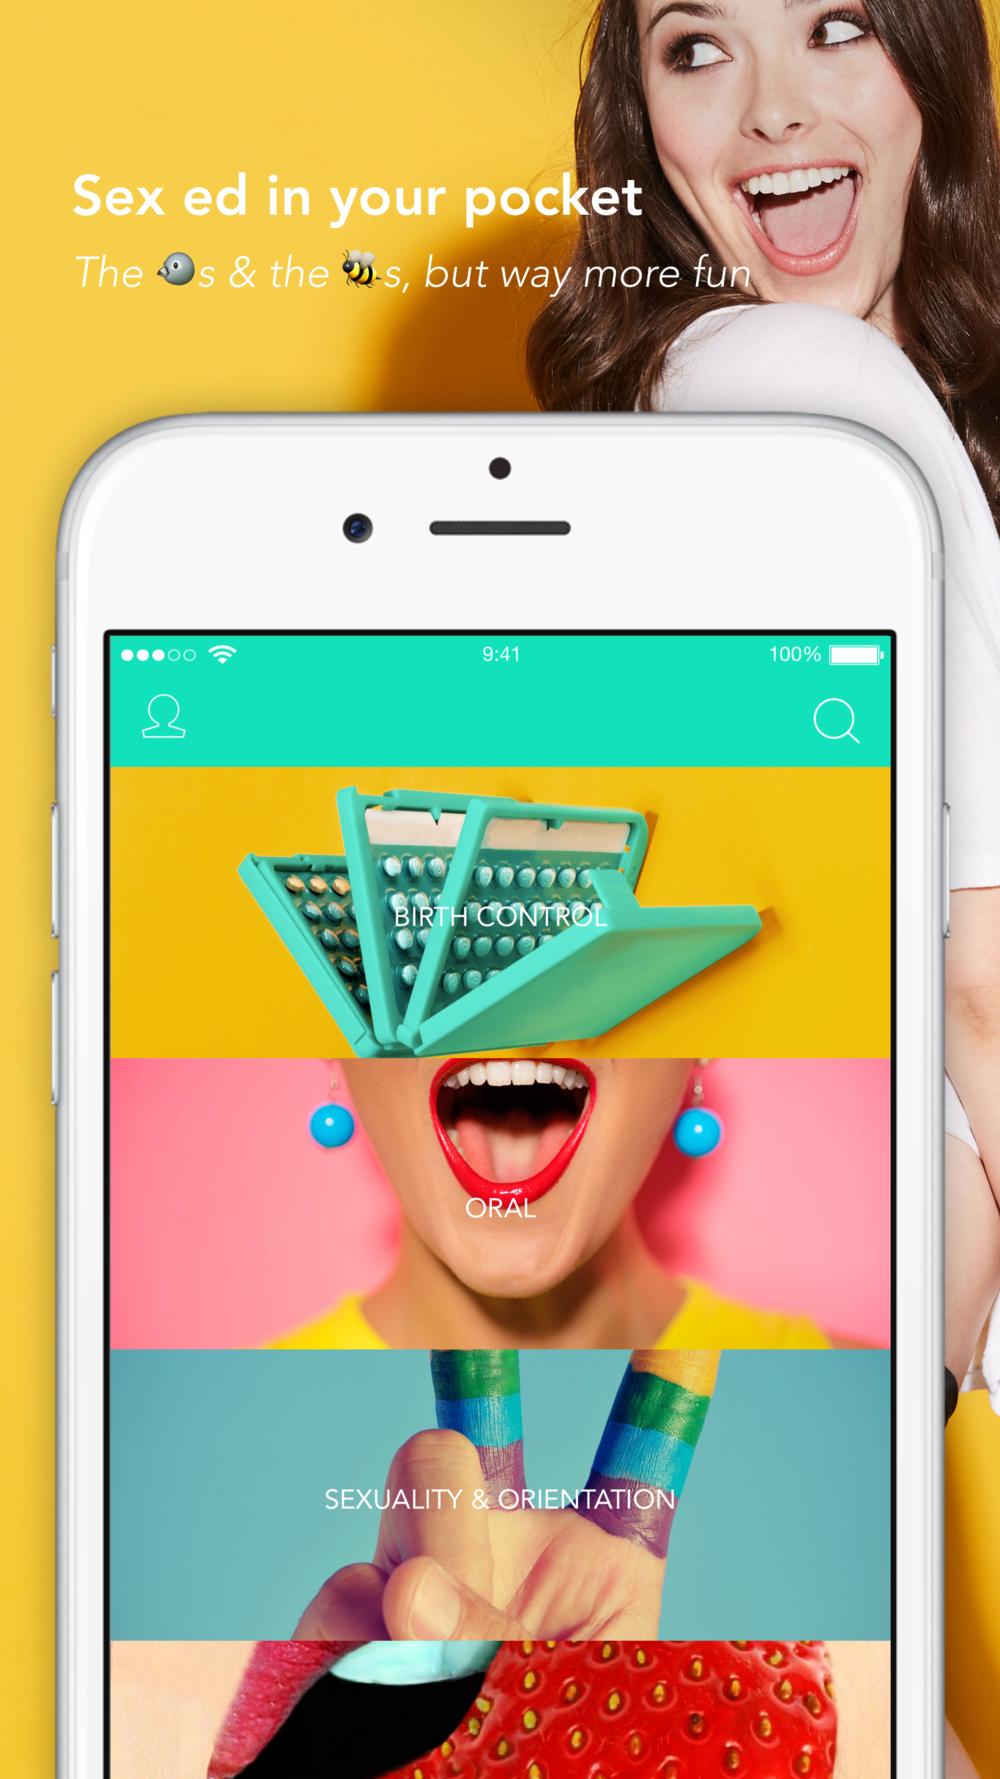 app store screen 4_final.png